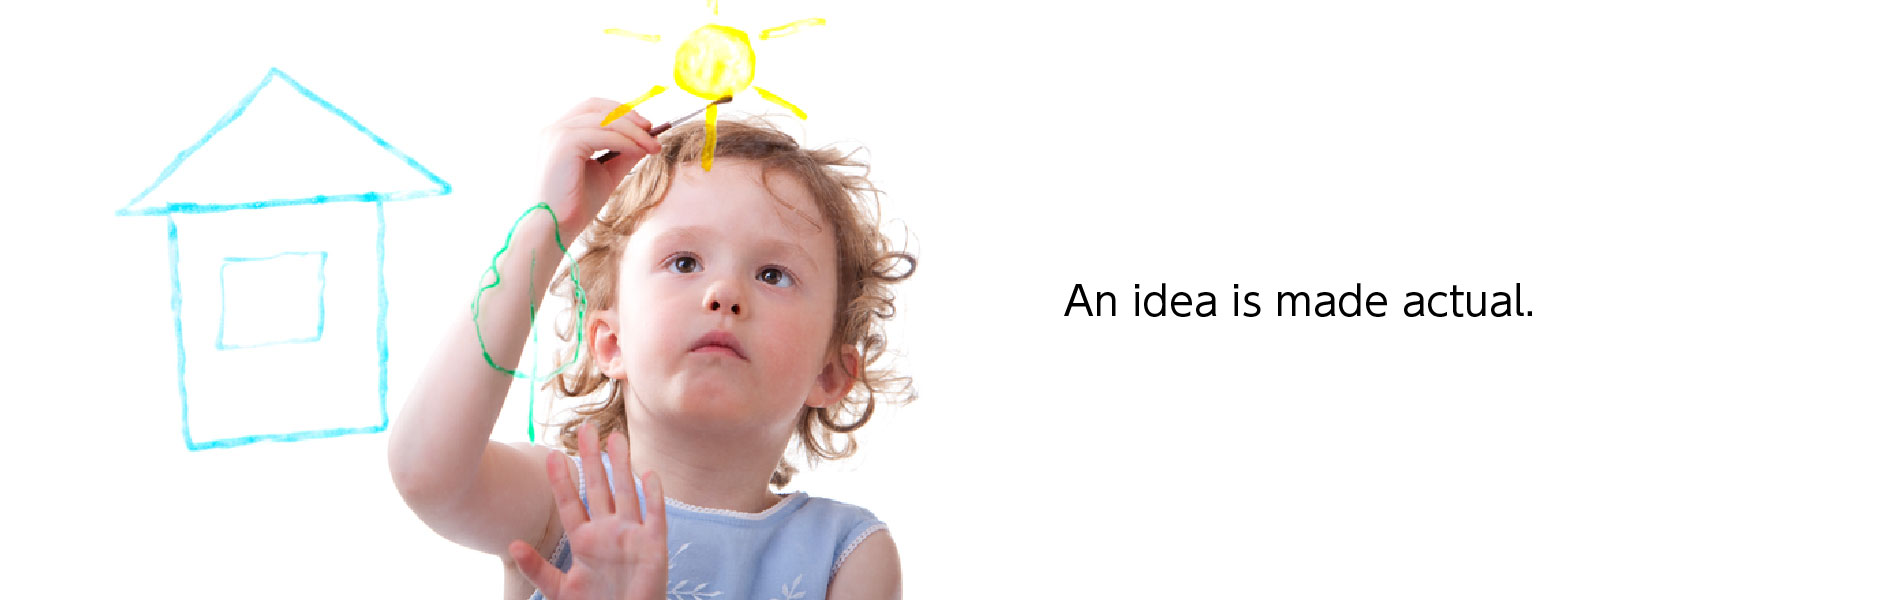 An Idea is made actual.